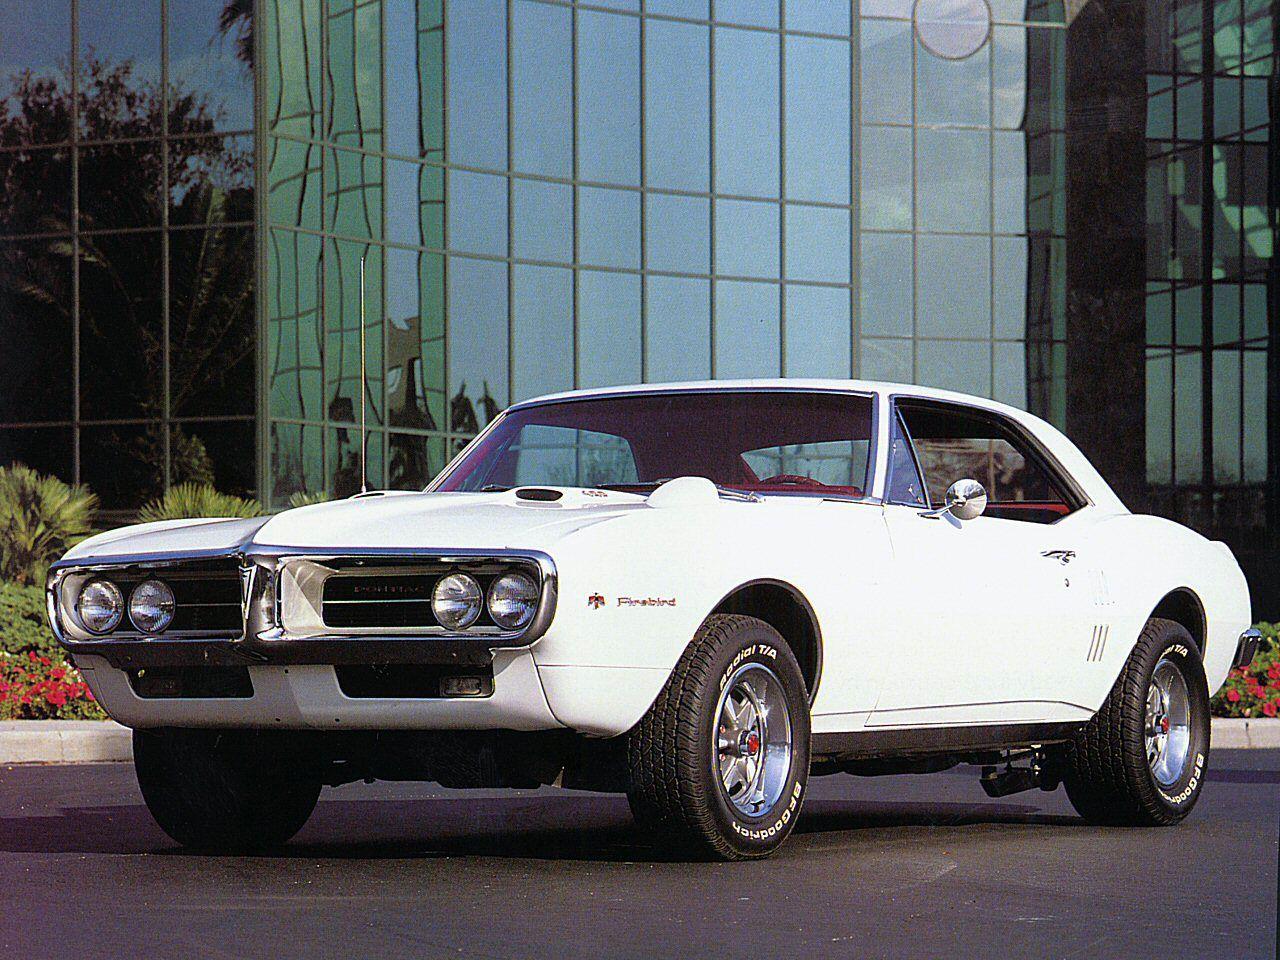 Pontiac firebird vintage parts remarkable, the